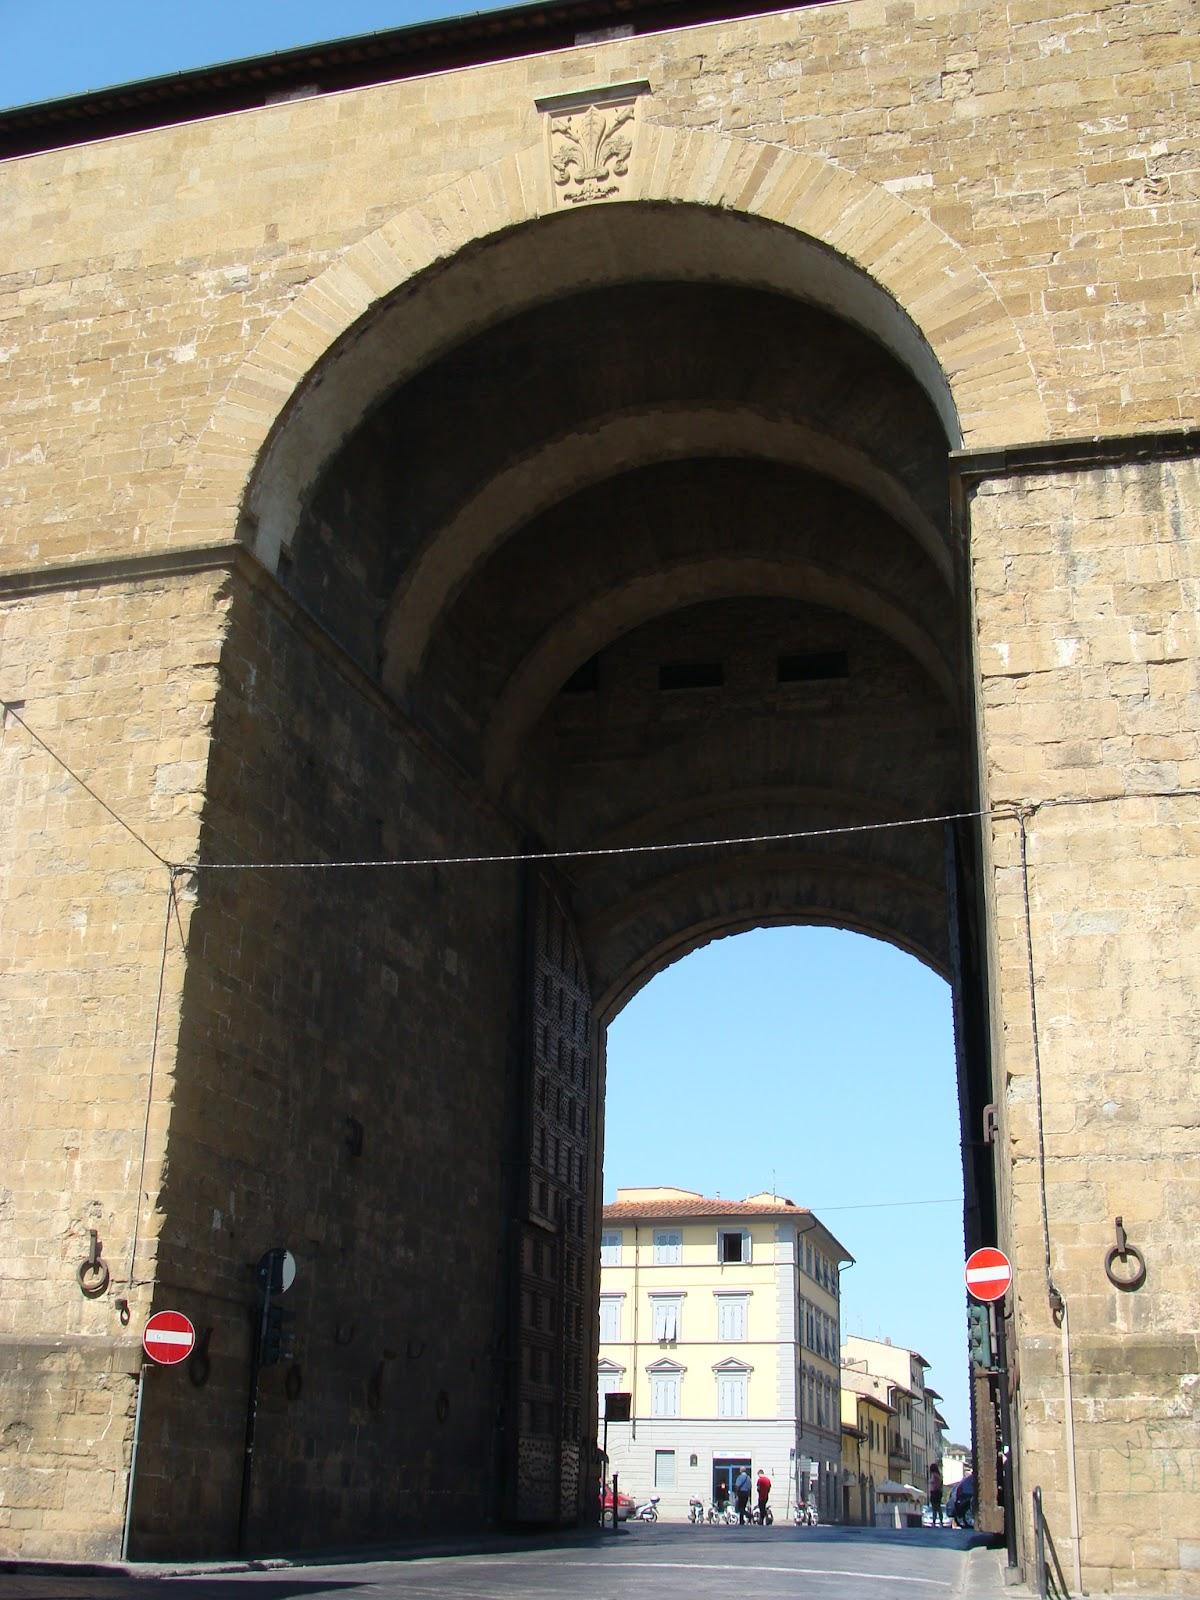 voragine porta romana florence - photo#31